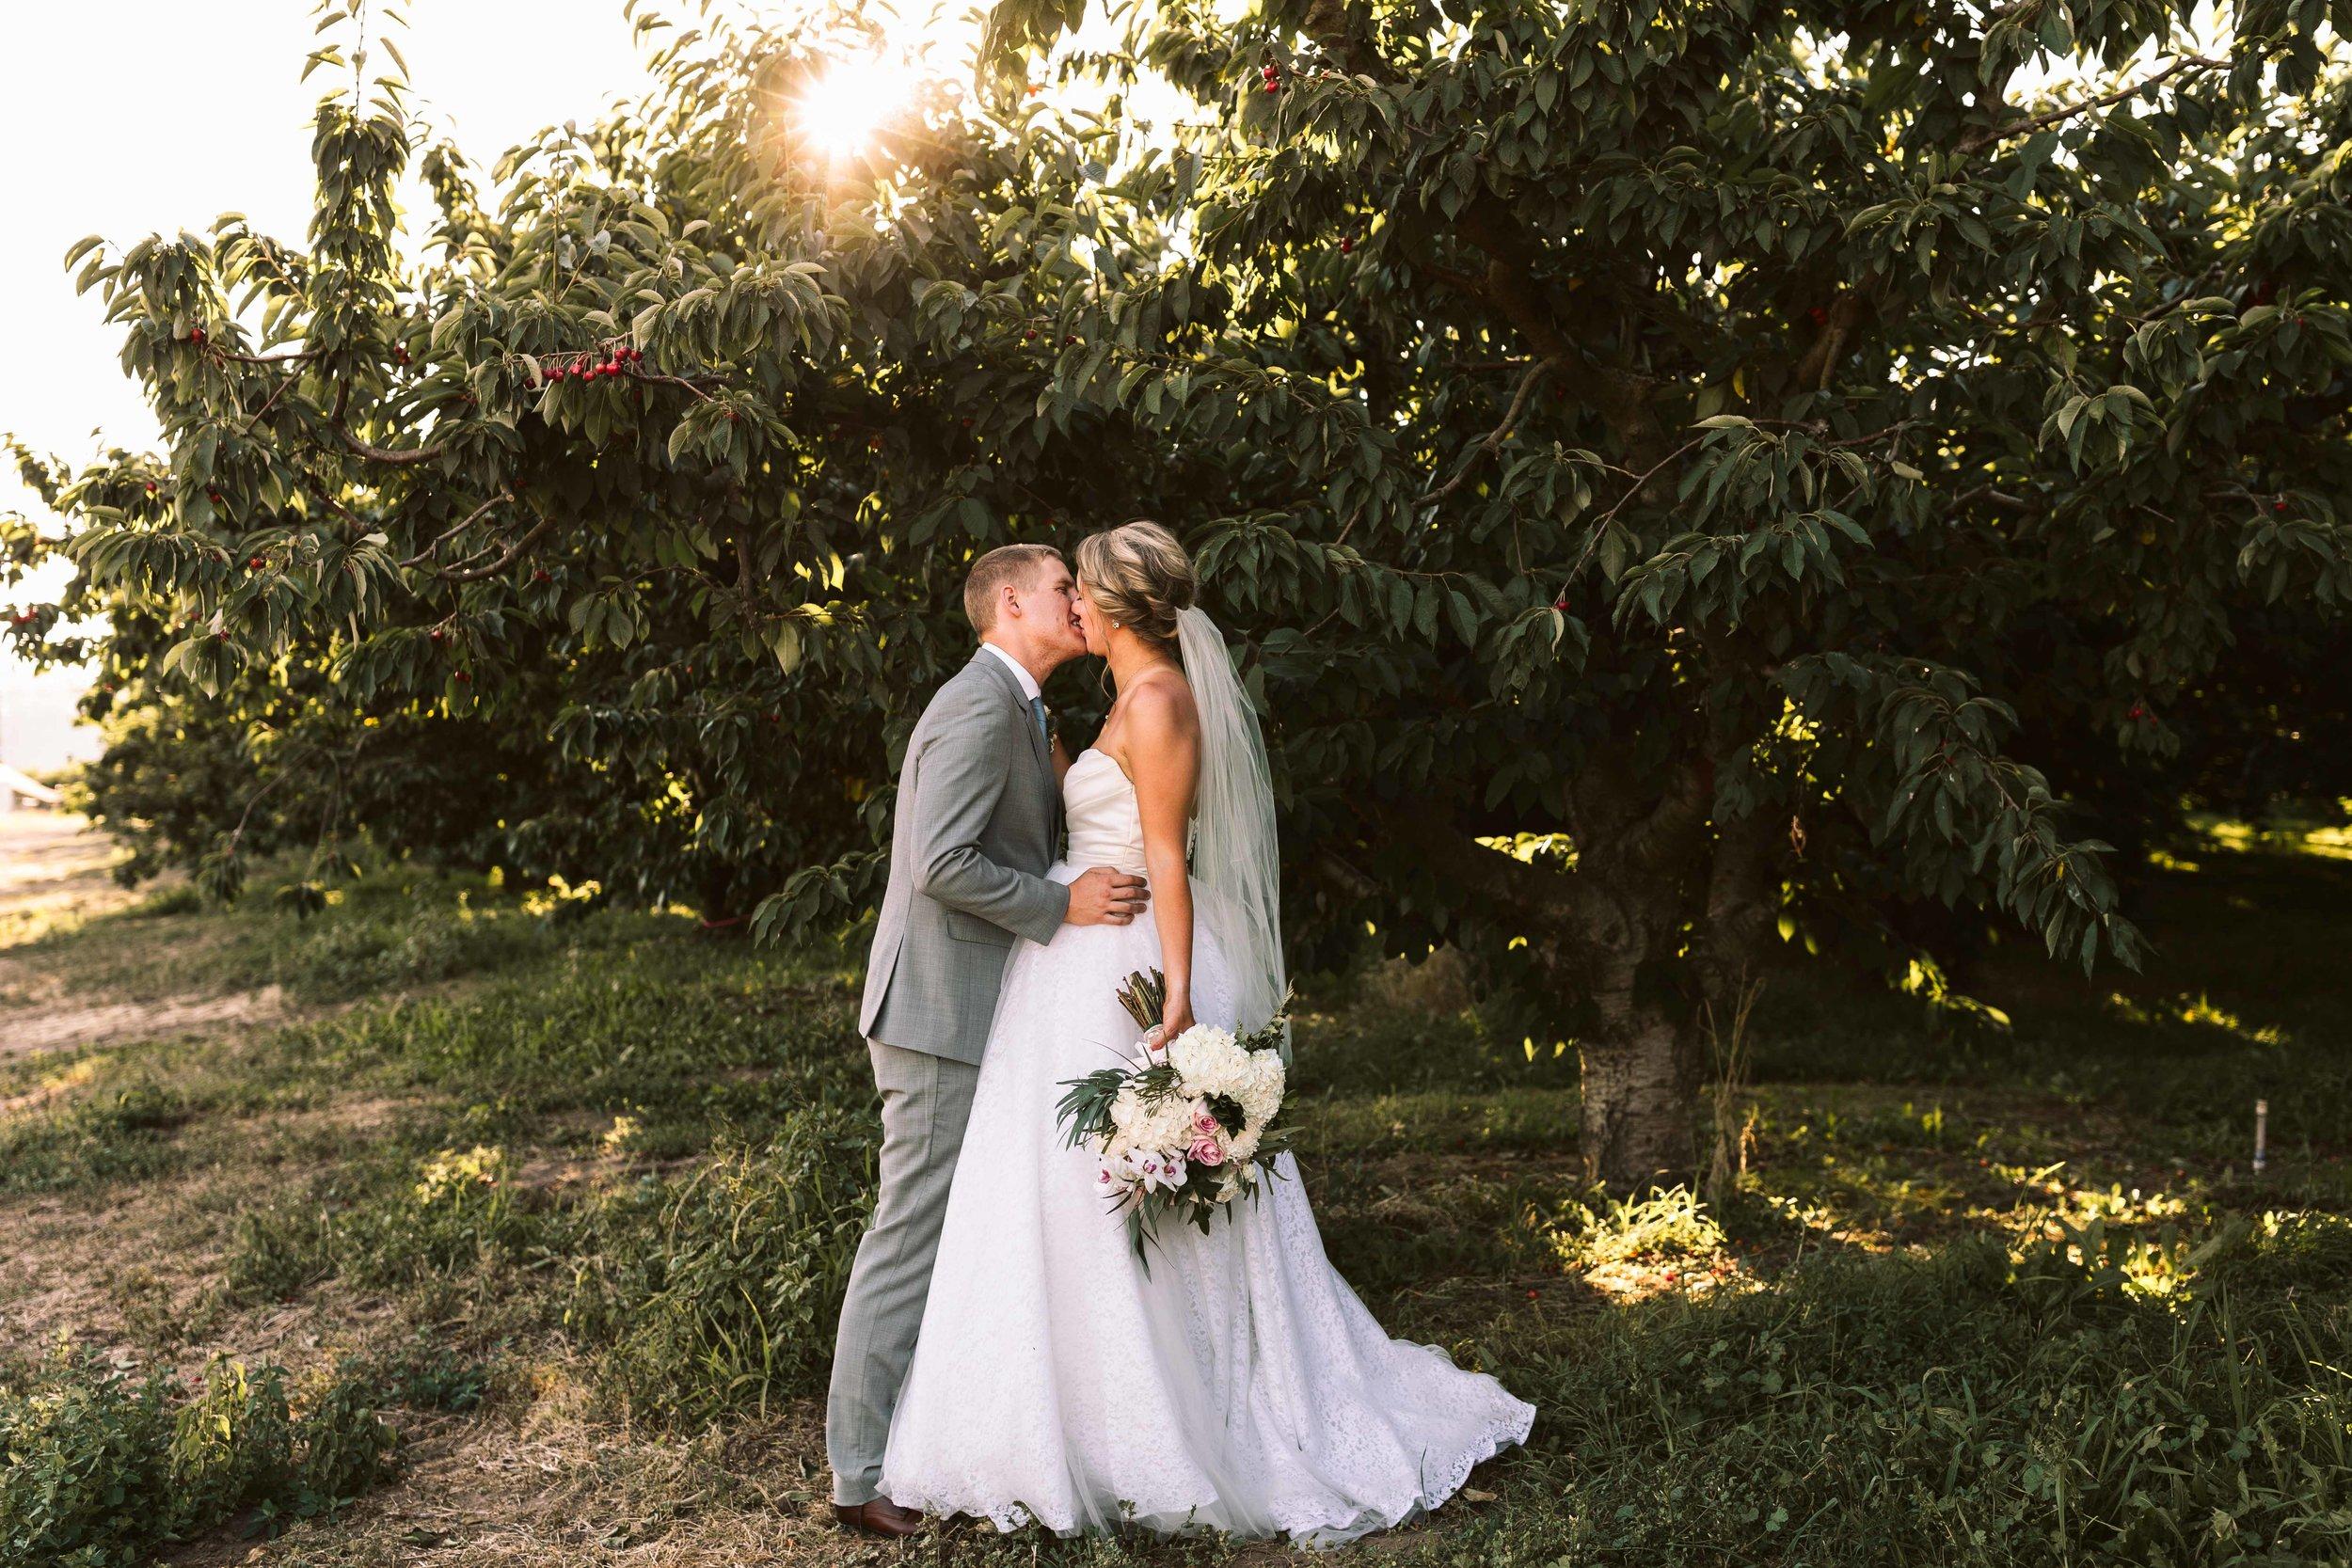 fontaine-estates-wedding-88.jpg